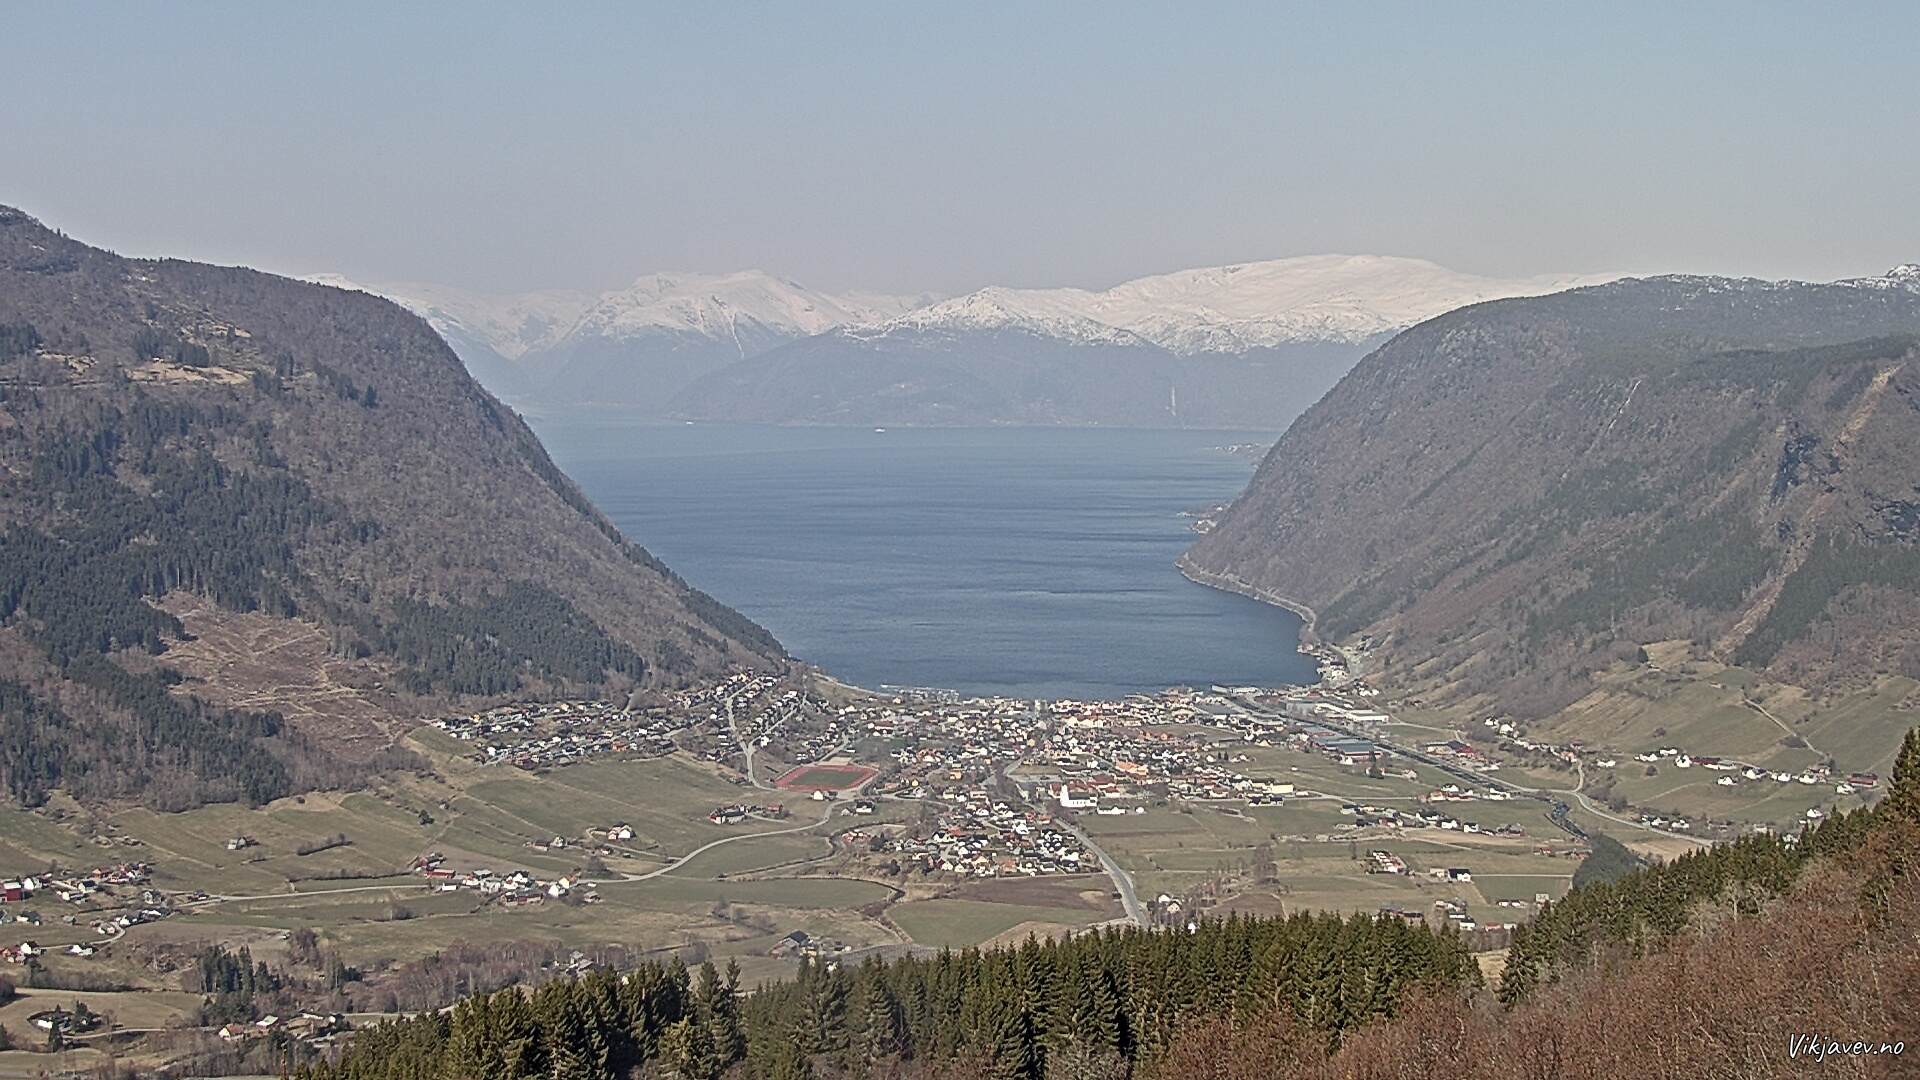 Vik i Sogn April 5, 2019 15:00